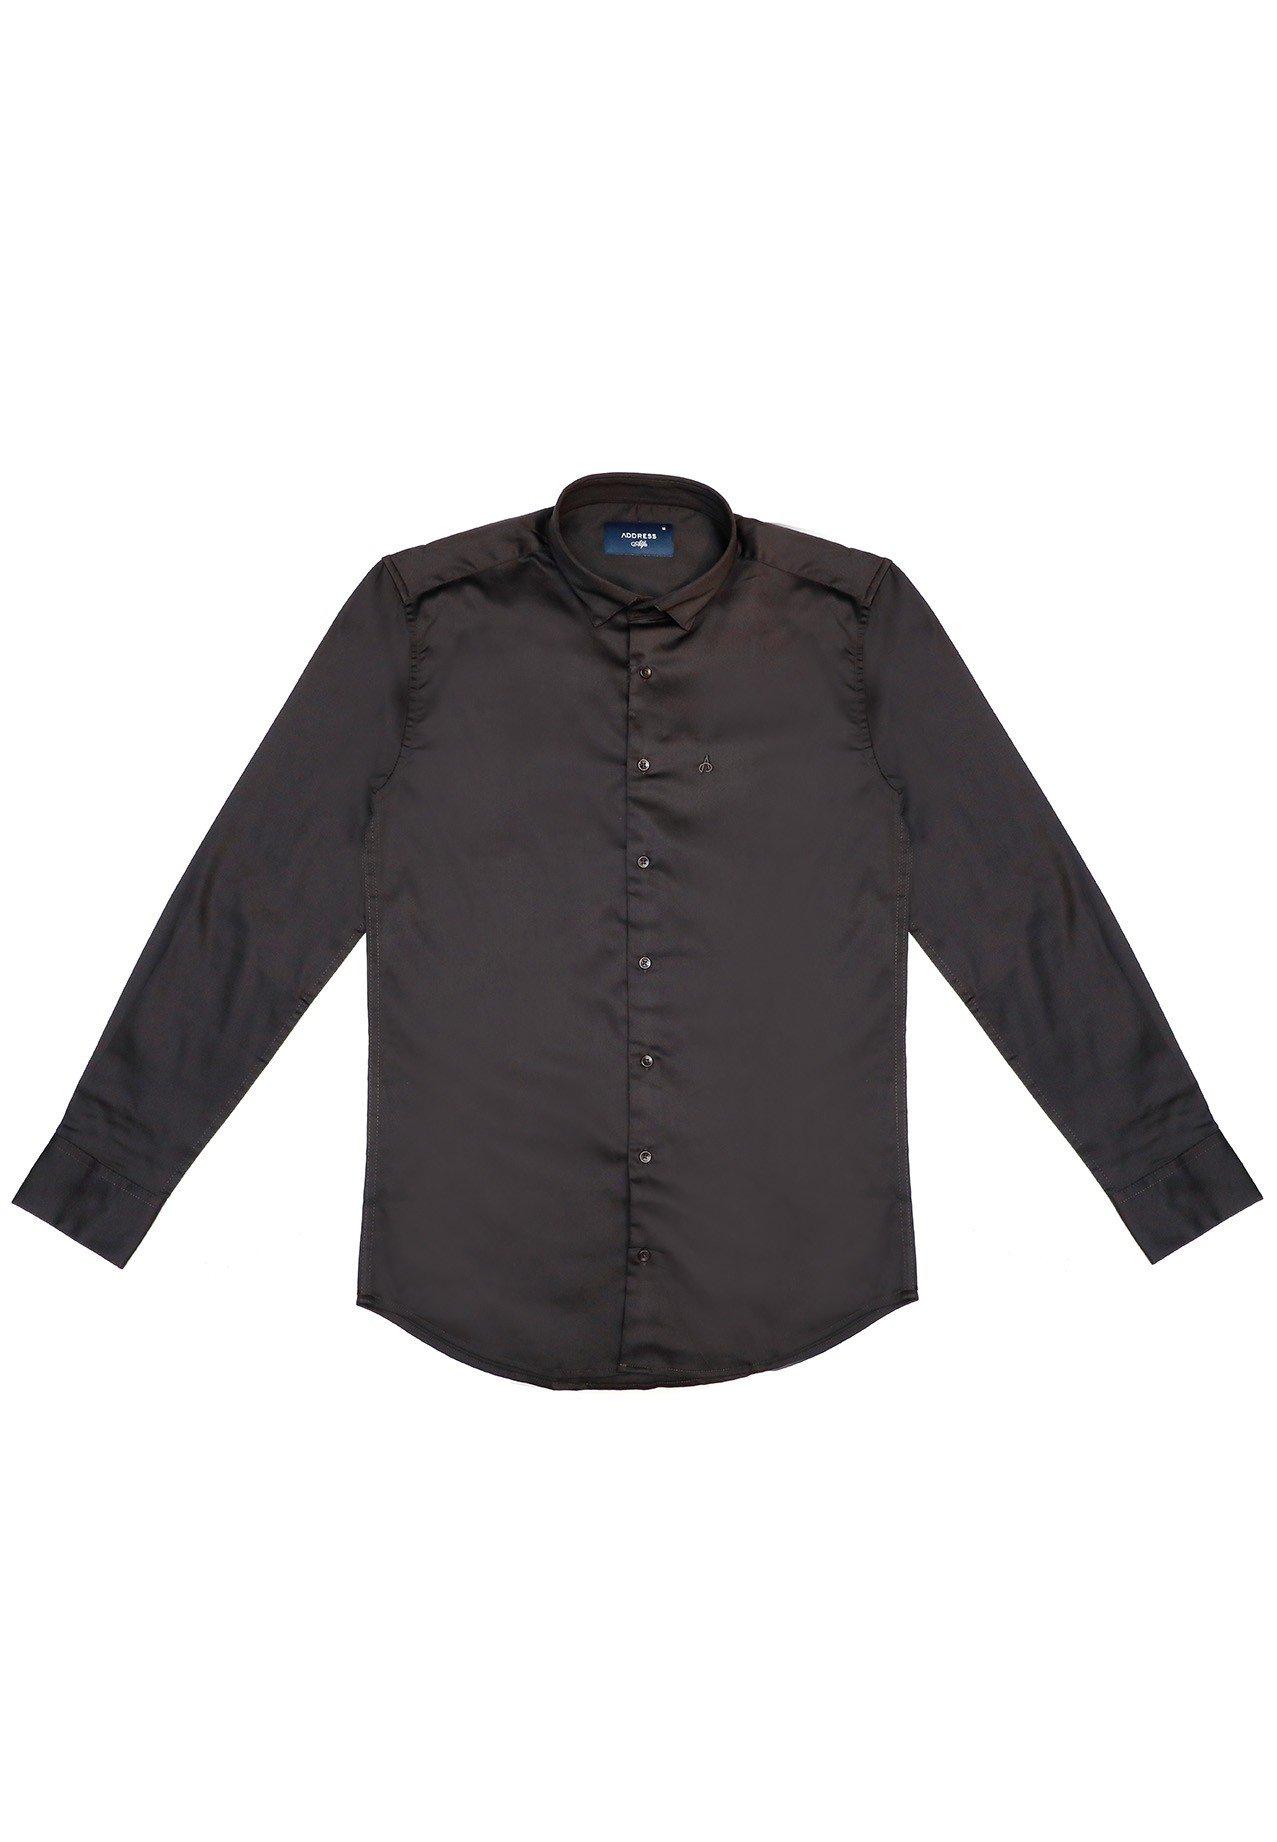 Address Formals Shirt Black, XXL